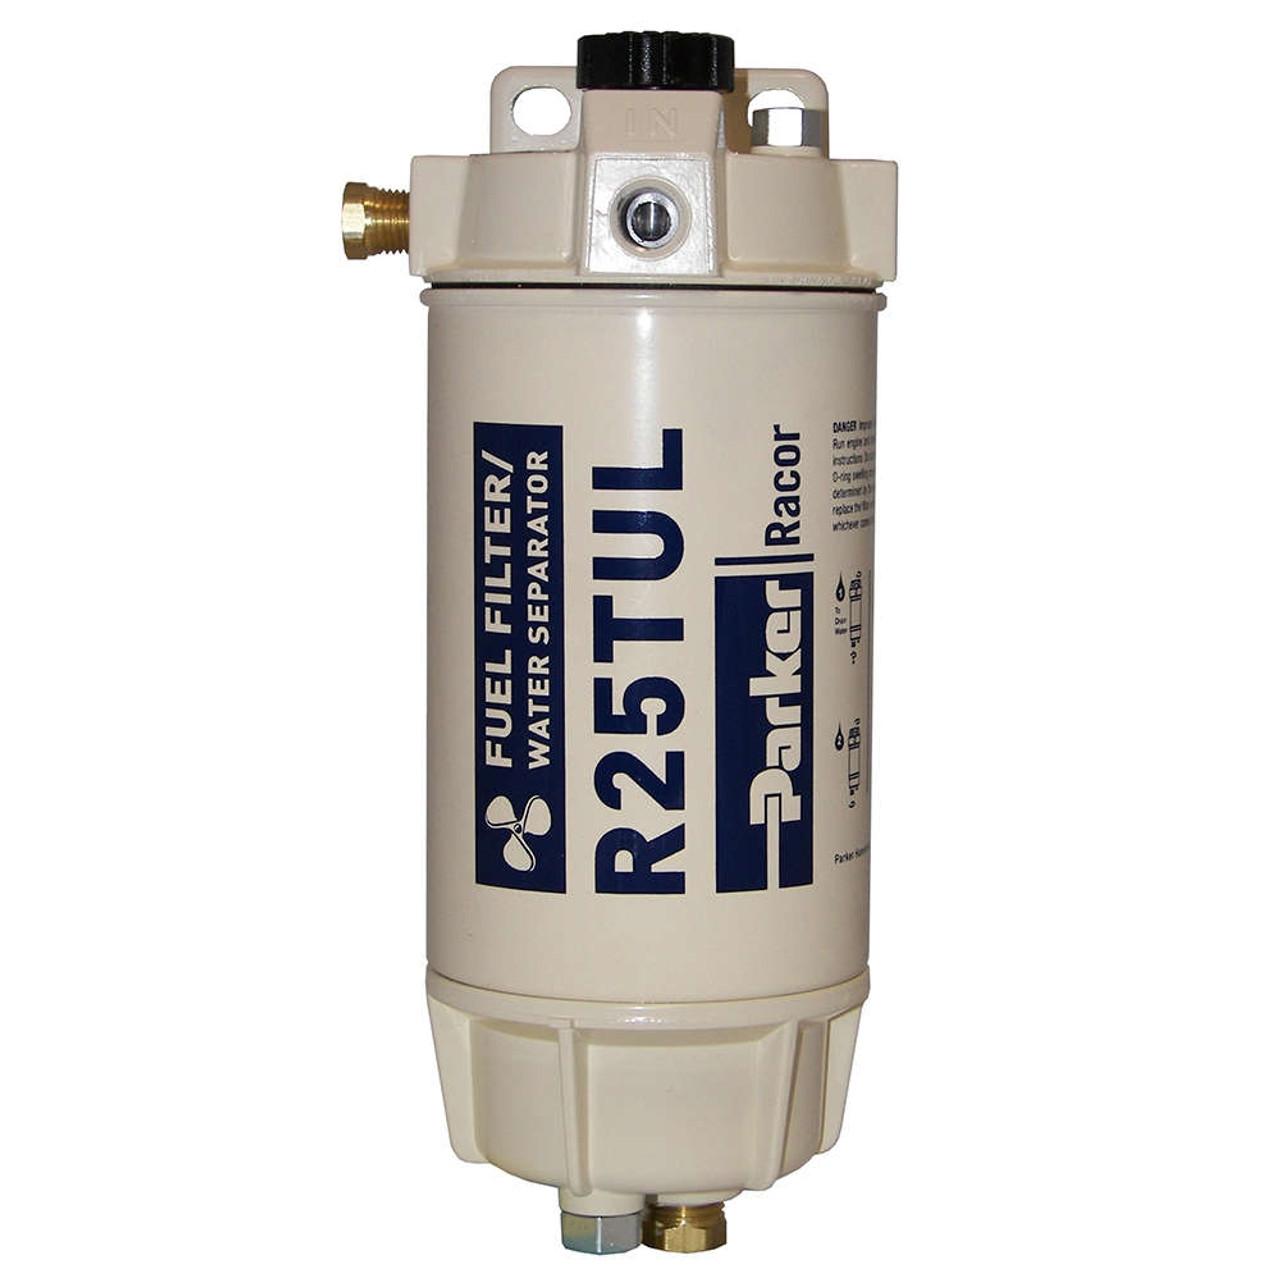 medium resolution of racor 1 4 in 45 gph aquabloc marine spin on type diesel fuel filter water separator assembly 6 qty john m ellsworth co inc